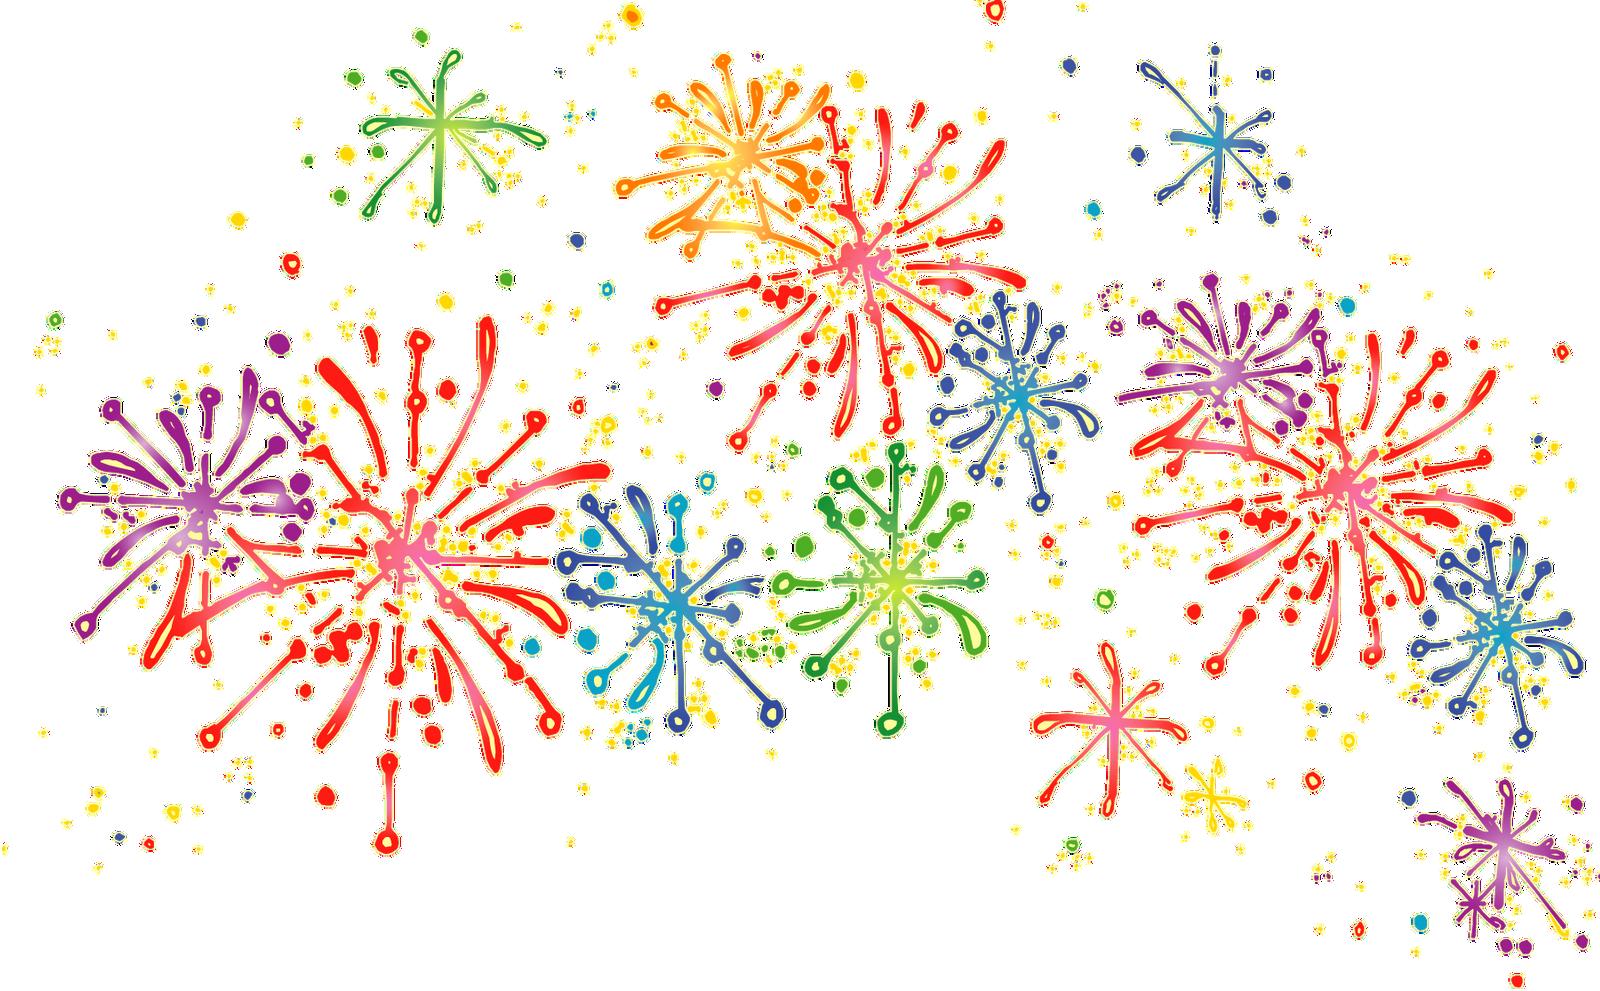 Colorful Fireworks PNG Transparent Clipart Image.